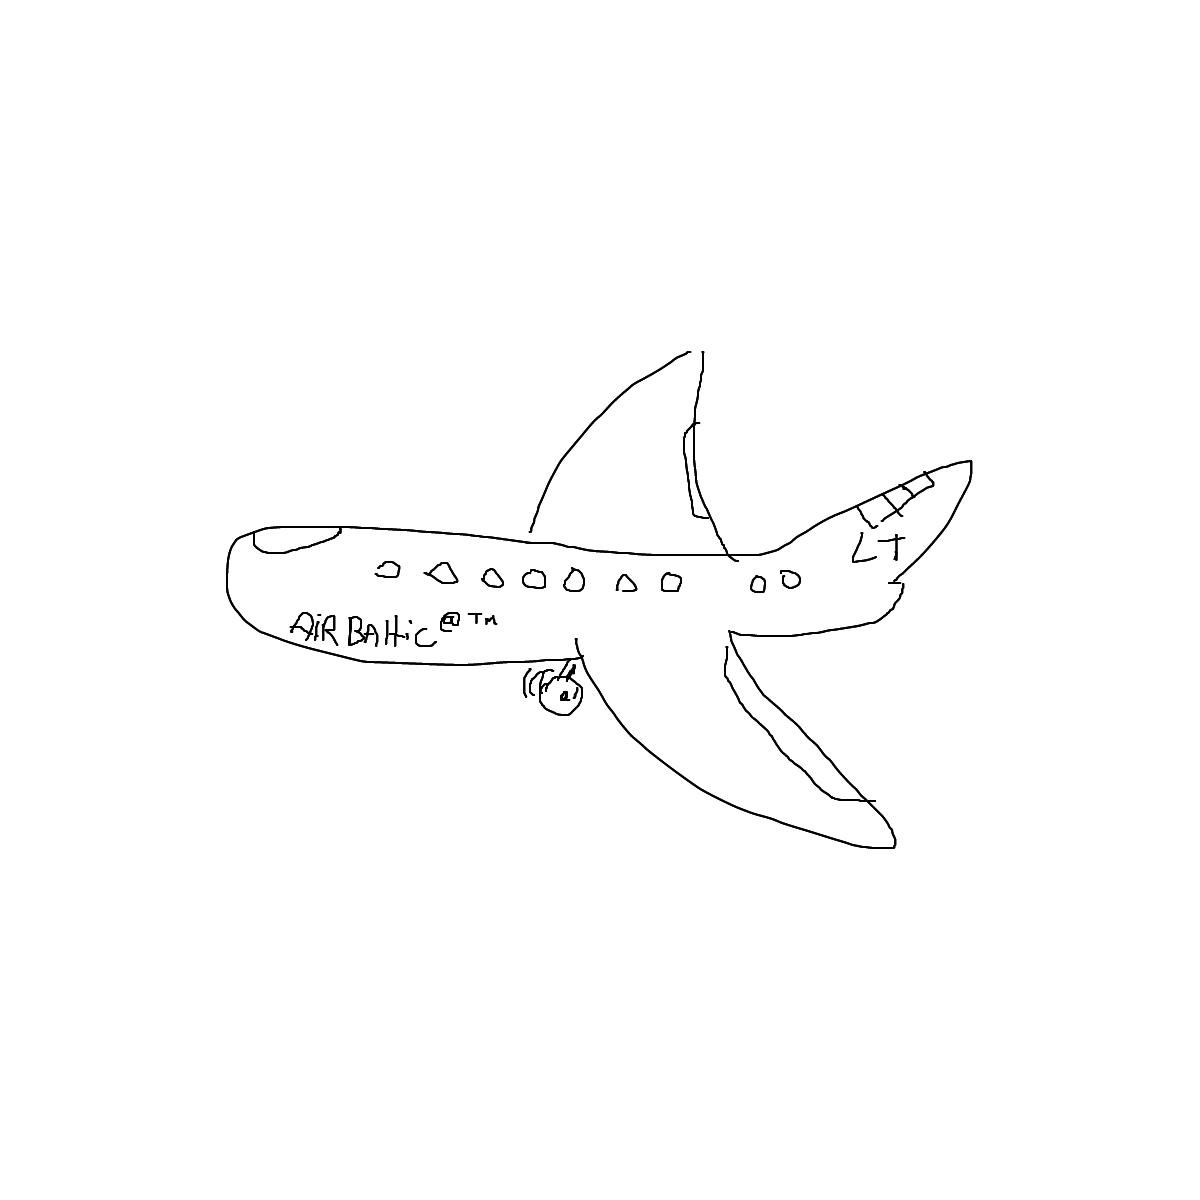 BAAAM drawing#8995 lat:54.6431159973144500lng: 25.2777976989746100